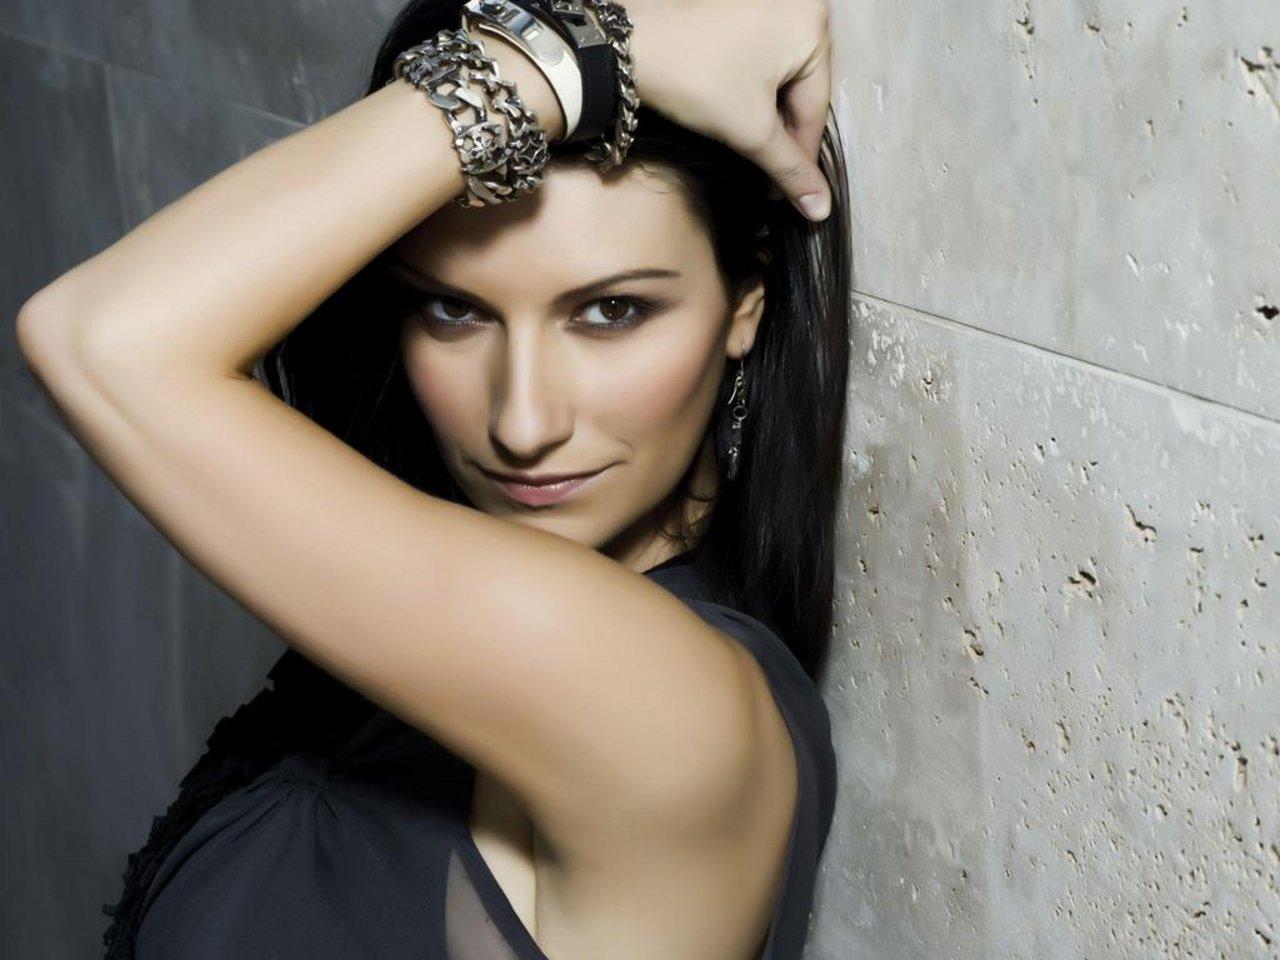 Laura Pausini testi canzoni | Lyrics di Album e Singoli